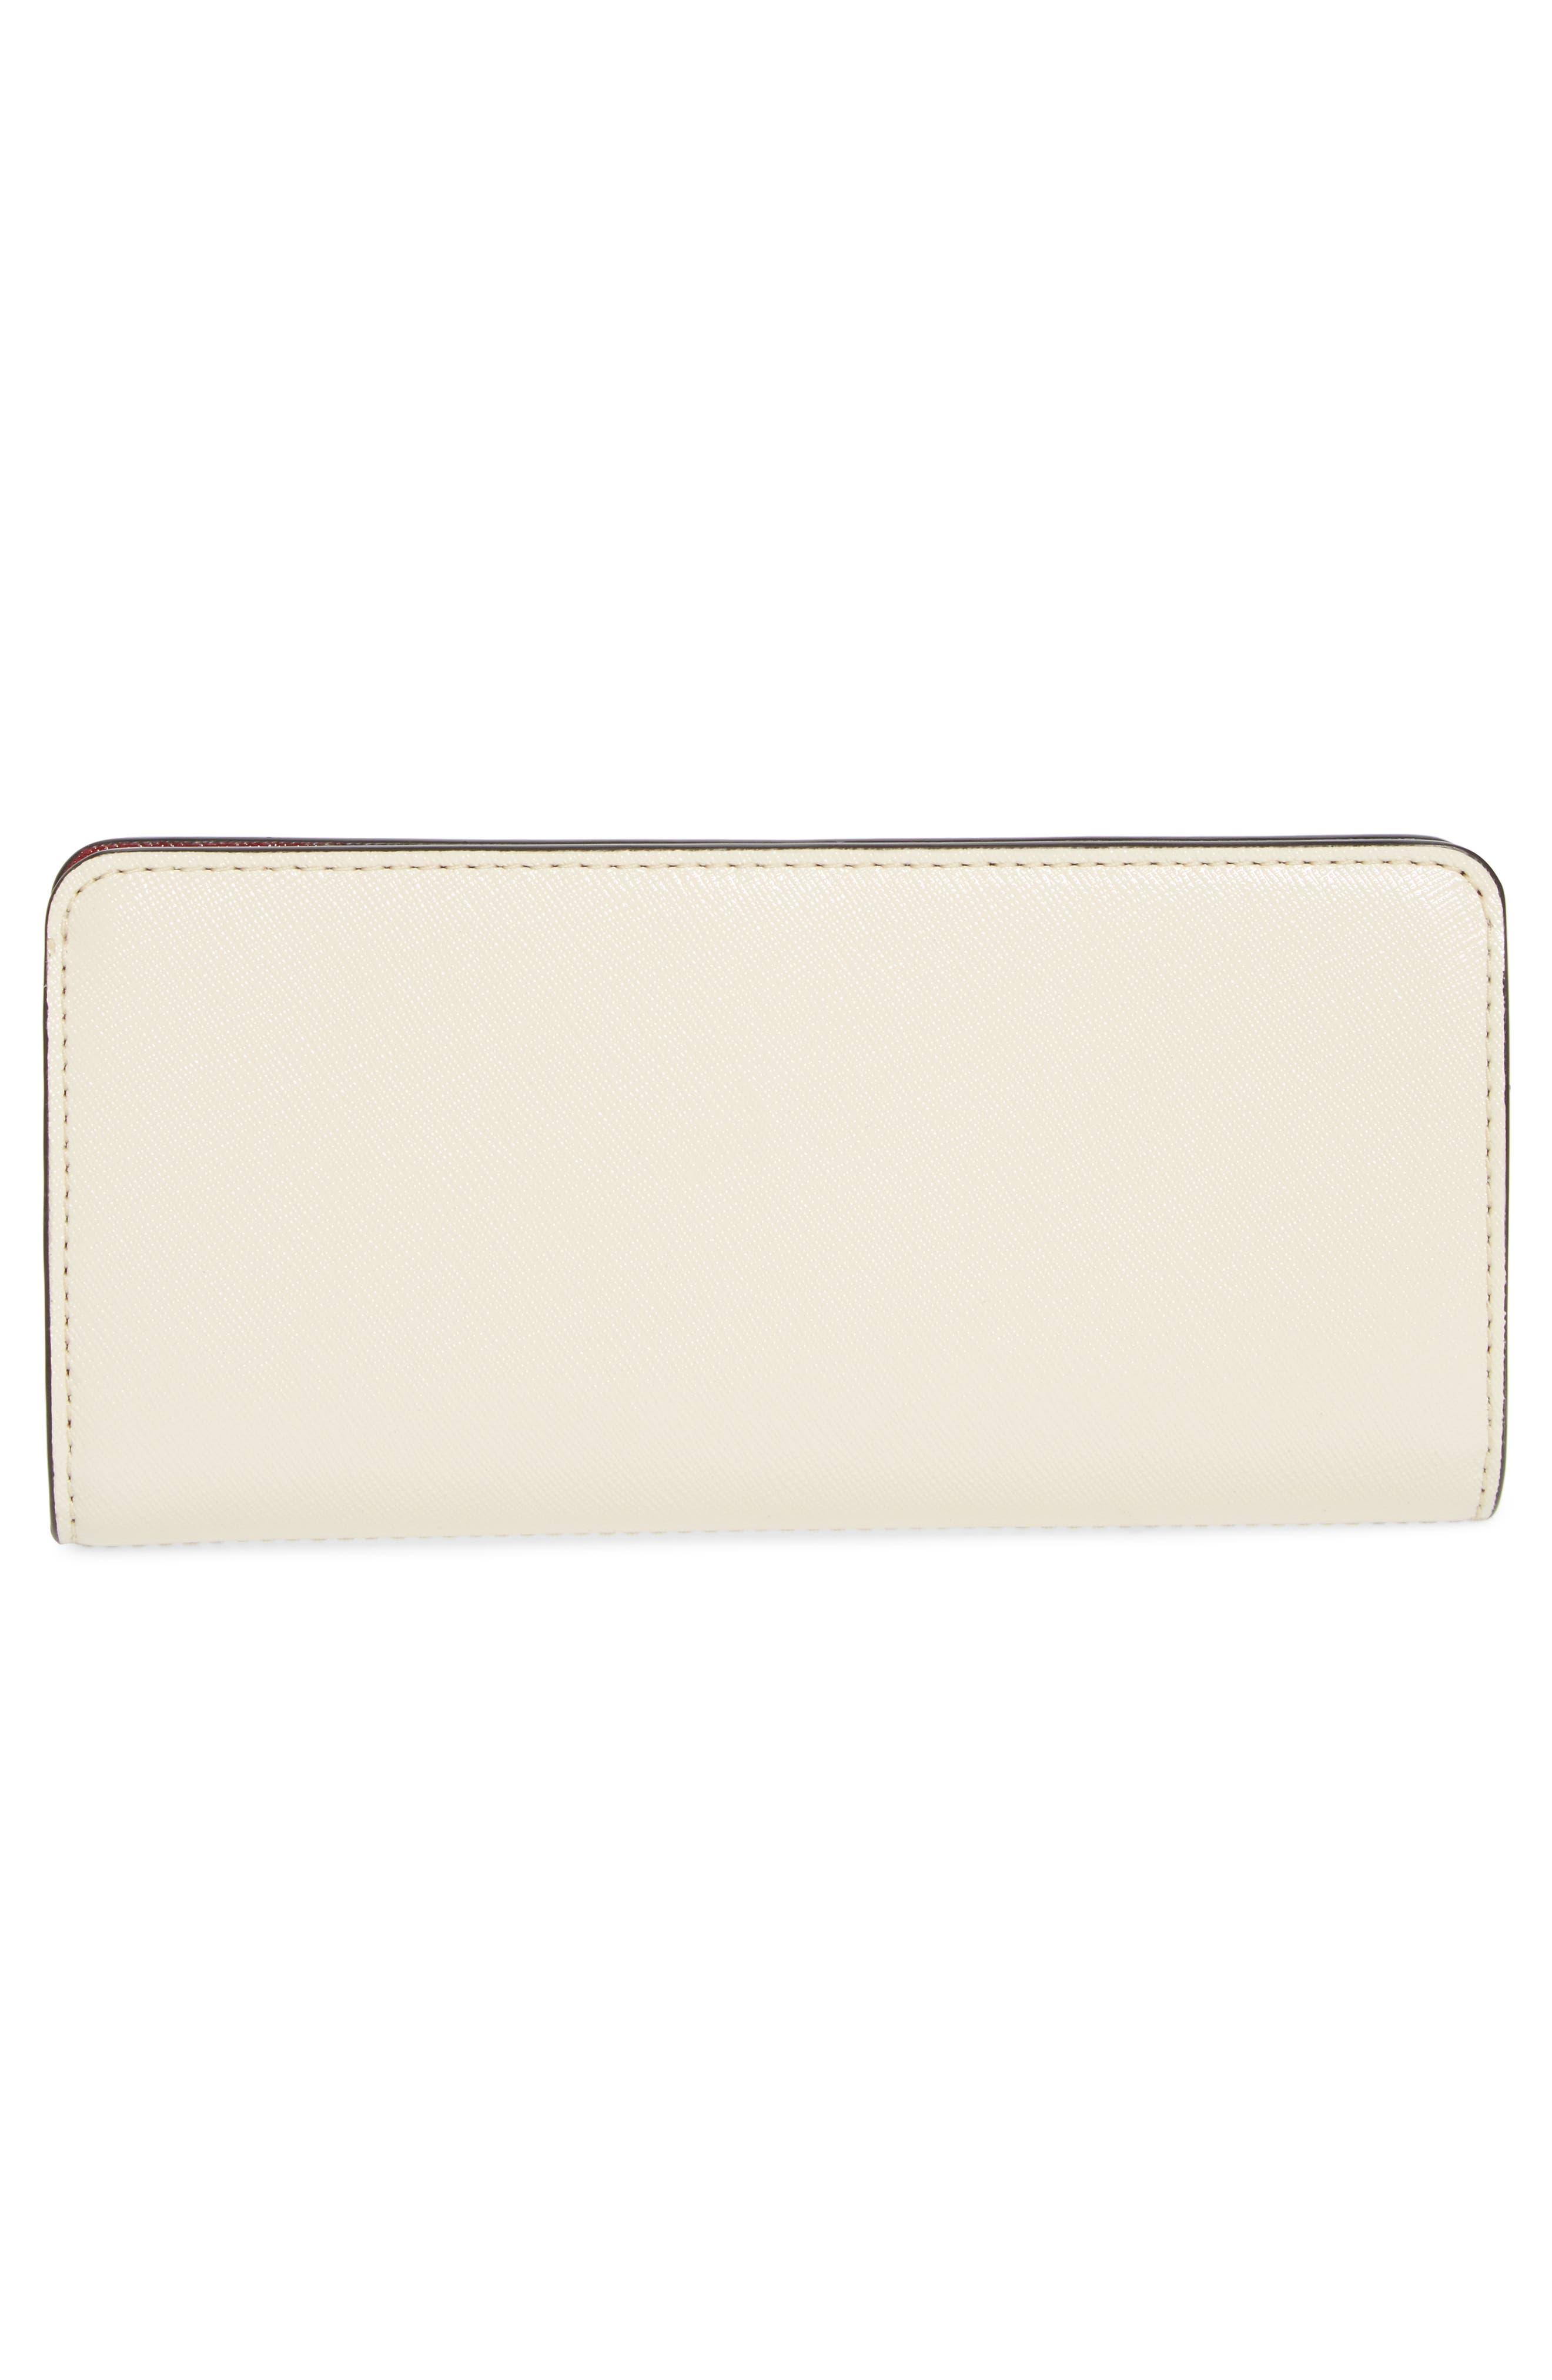 Snapshot Open Face Leather Wallet,                             Alternate thumbnail 4, color,                             Light Slate Multi